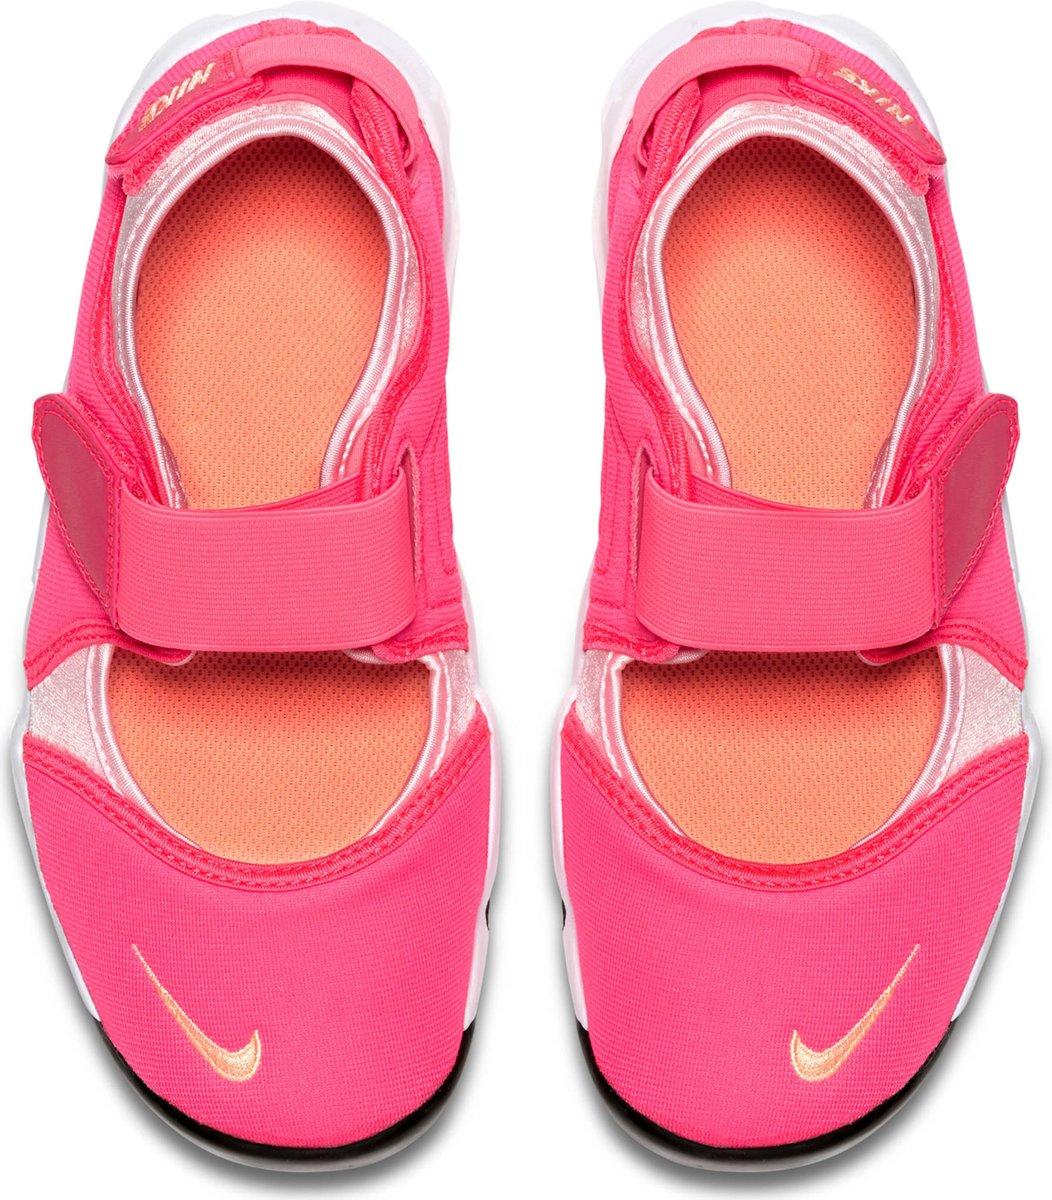 Nike Junior Sandales De Randonnée De Sandales Baskets Rift - Taille 32 - Unisex - Rose nJwdLWf7